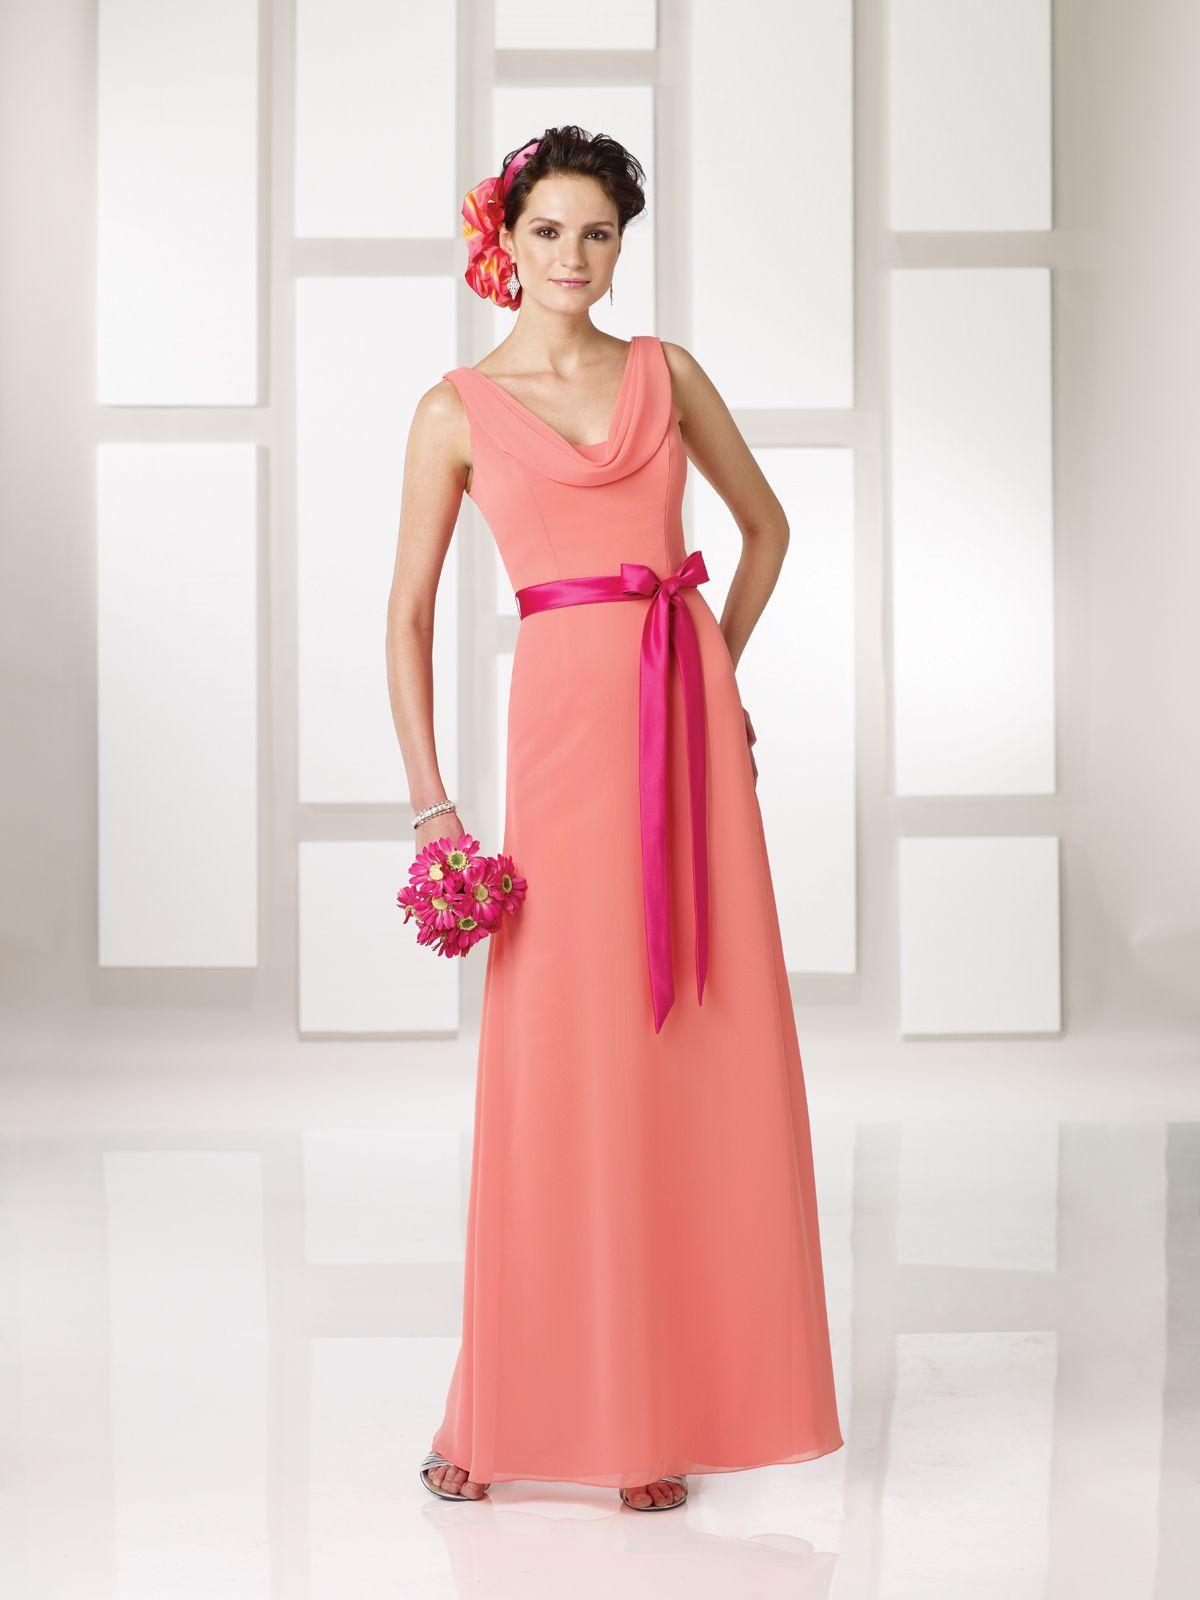 I love these colors together | MODA VESTIDOS | Pinterest | Moda vestidos